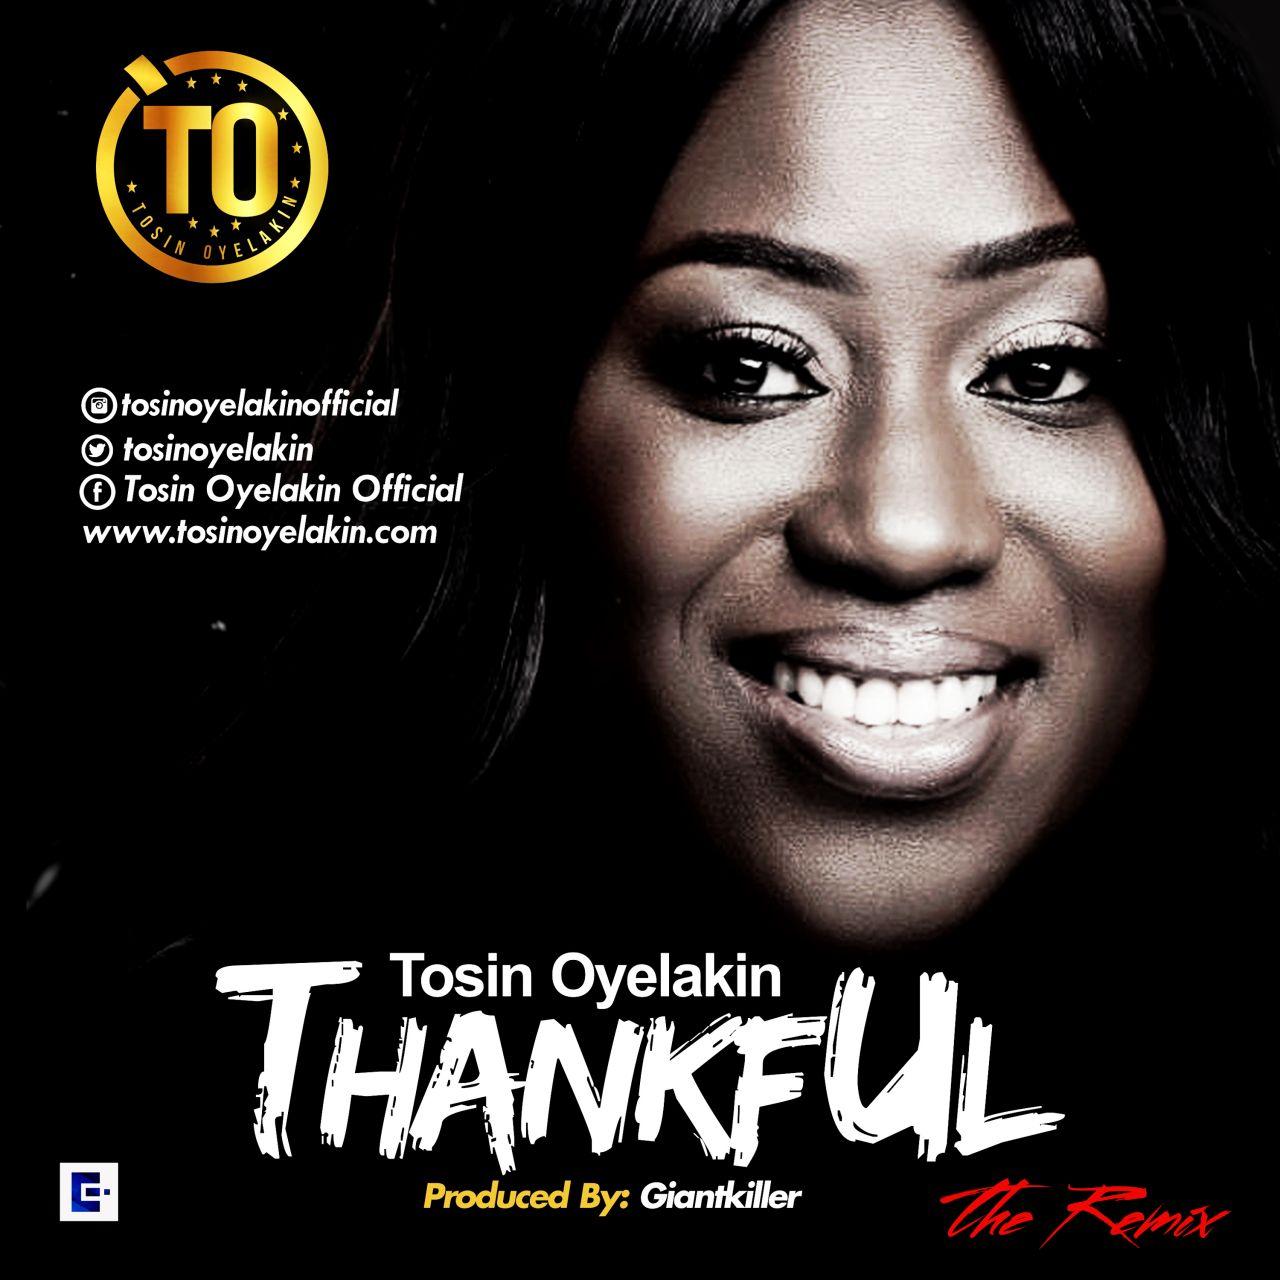 THANKFUL (REMIX) - Tosin Oyelakin [@TosinOyelakin]